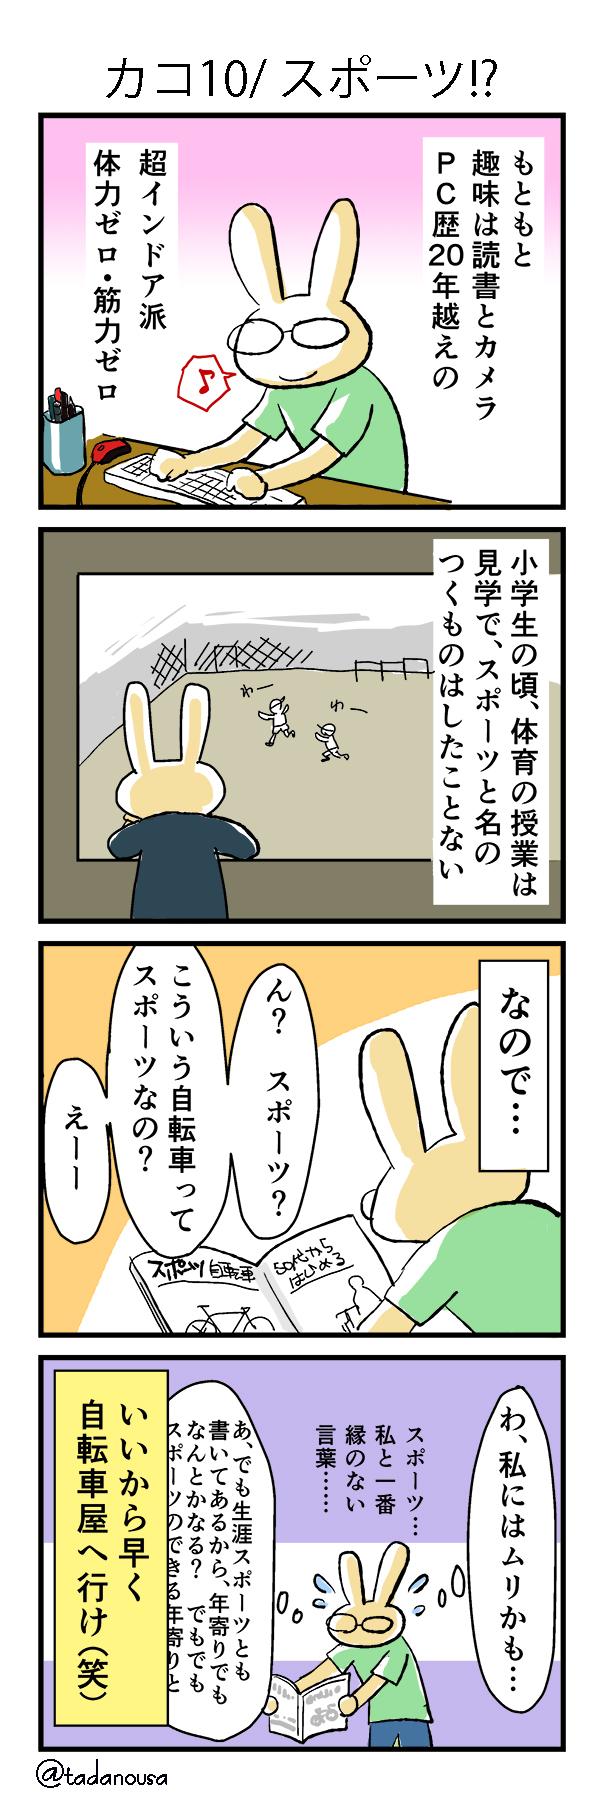 bike_4koma_kako010_s.jpg